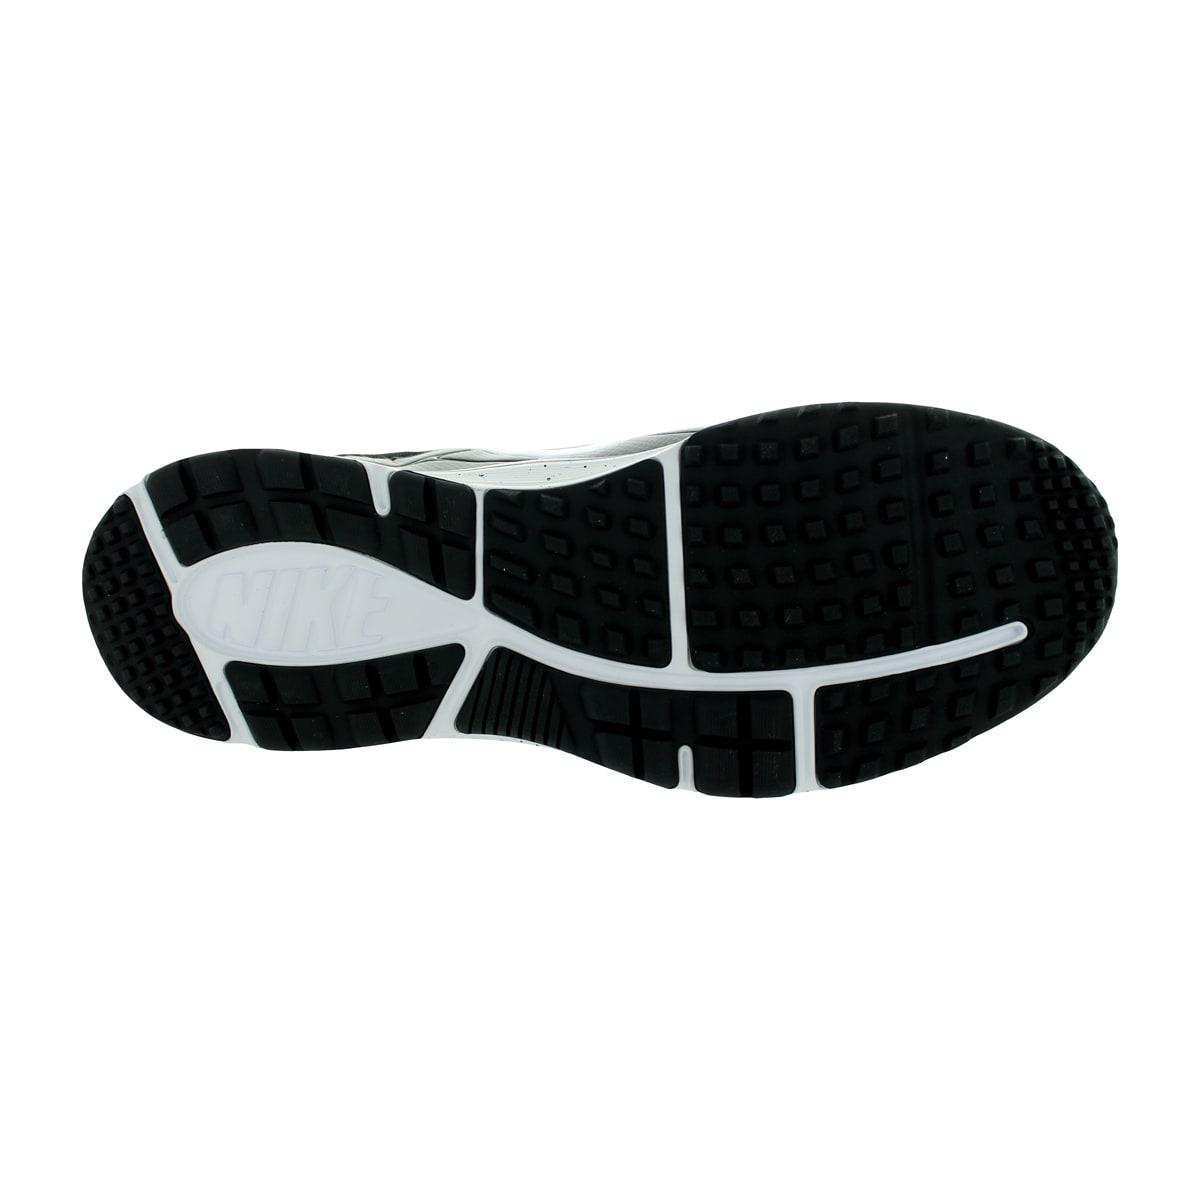 timeless design 348c0 00ead Shop Nike Men s Lunar Mvp Pregame 2 Black White Training Shoe - Free  Shipping Today - Overstock - 12330894